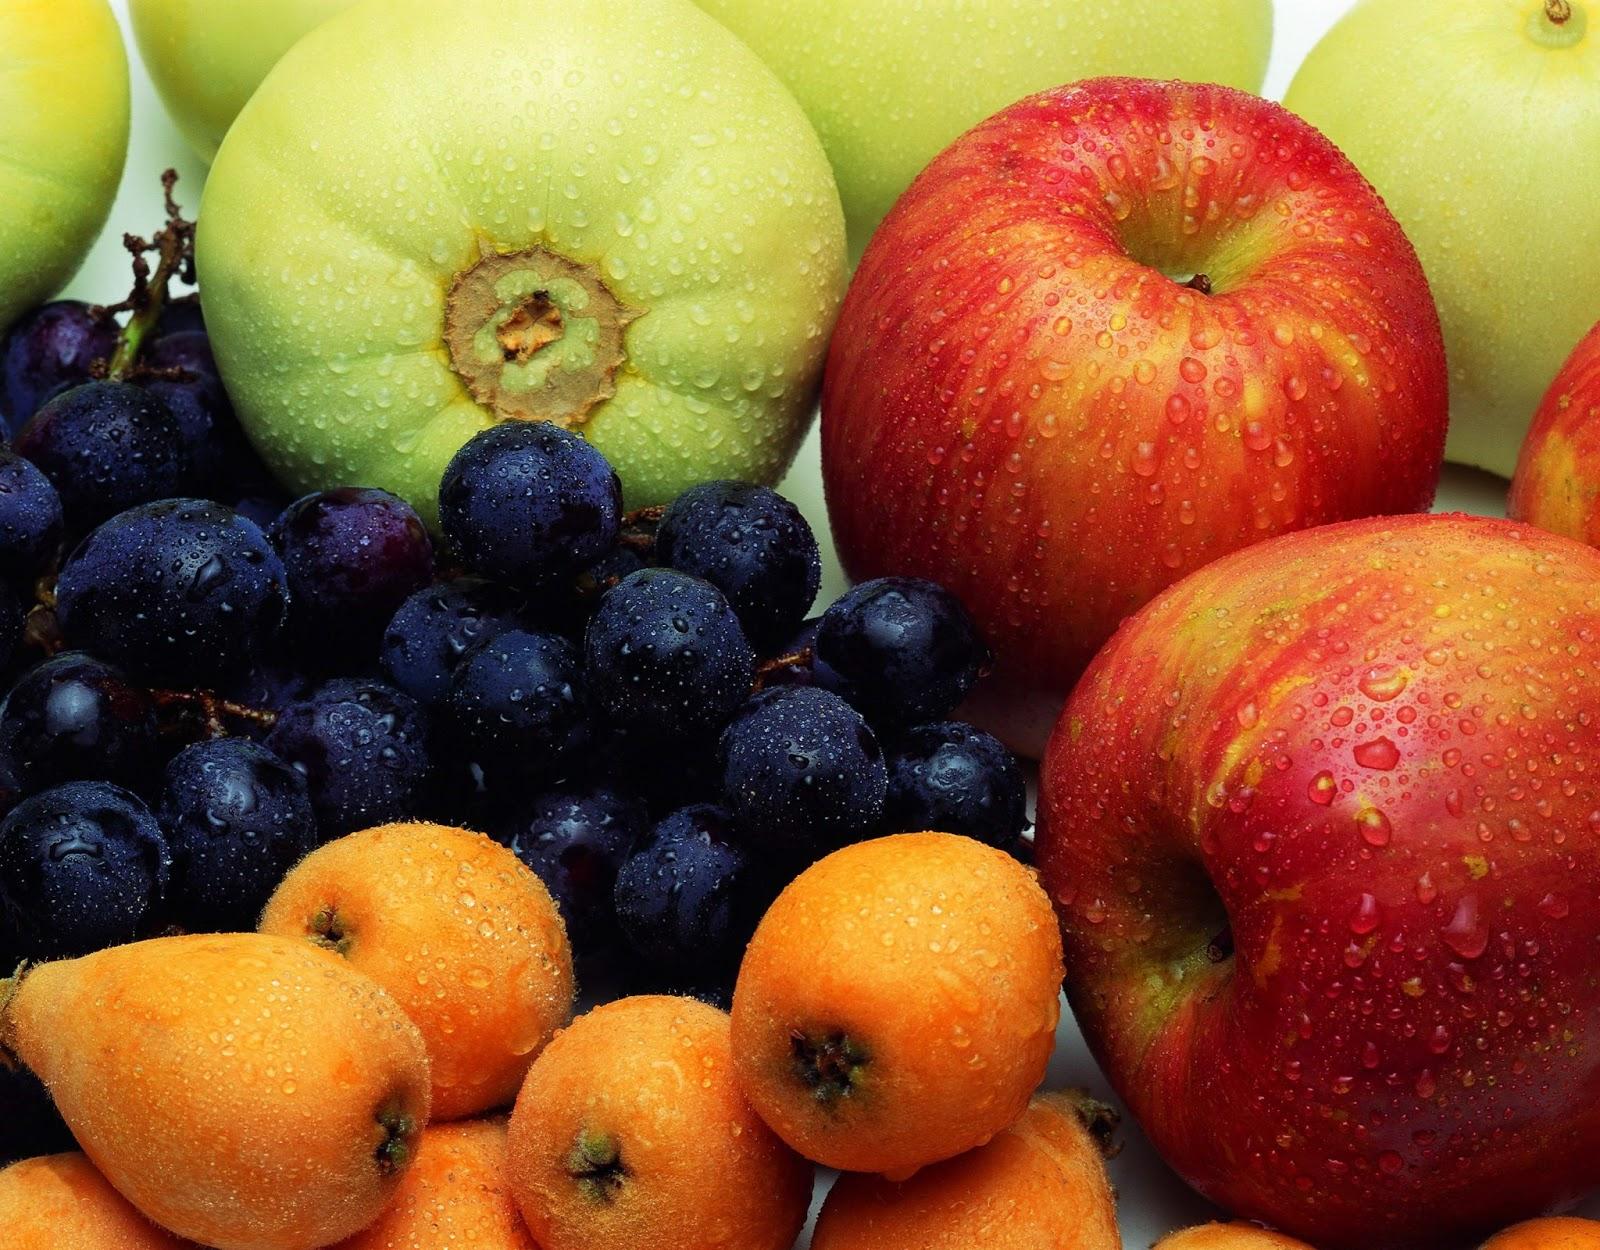 Beautiful wallpapers beautiful fruits wallpapers for Beautiful vegetables